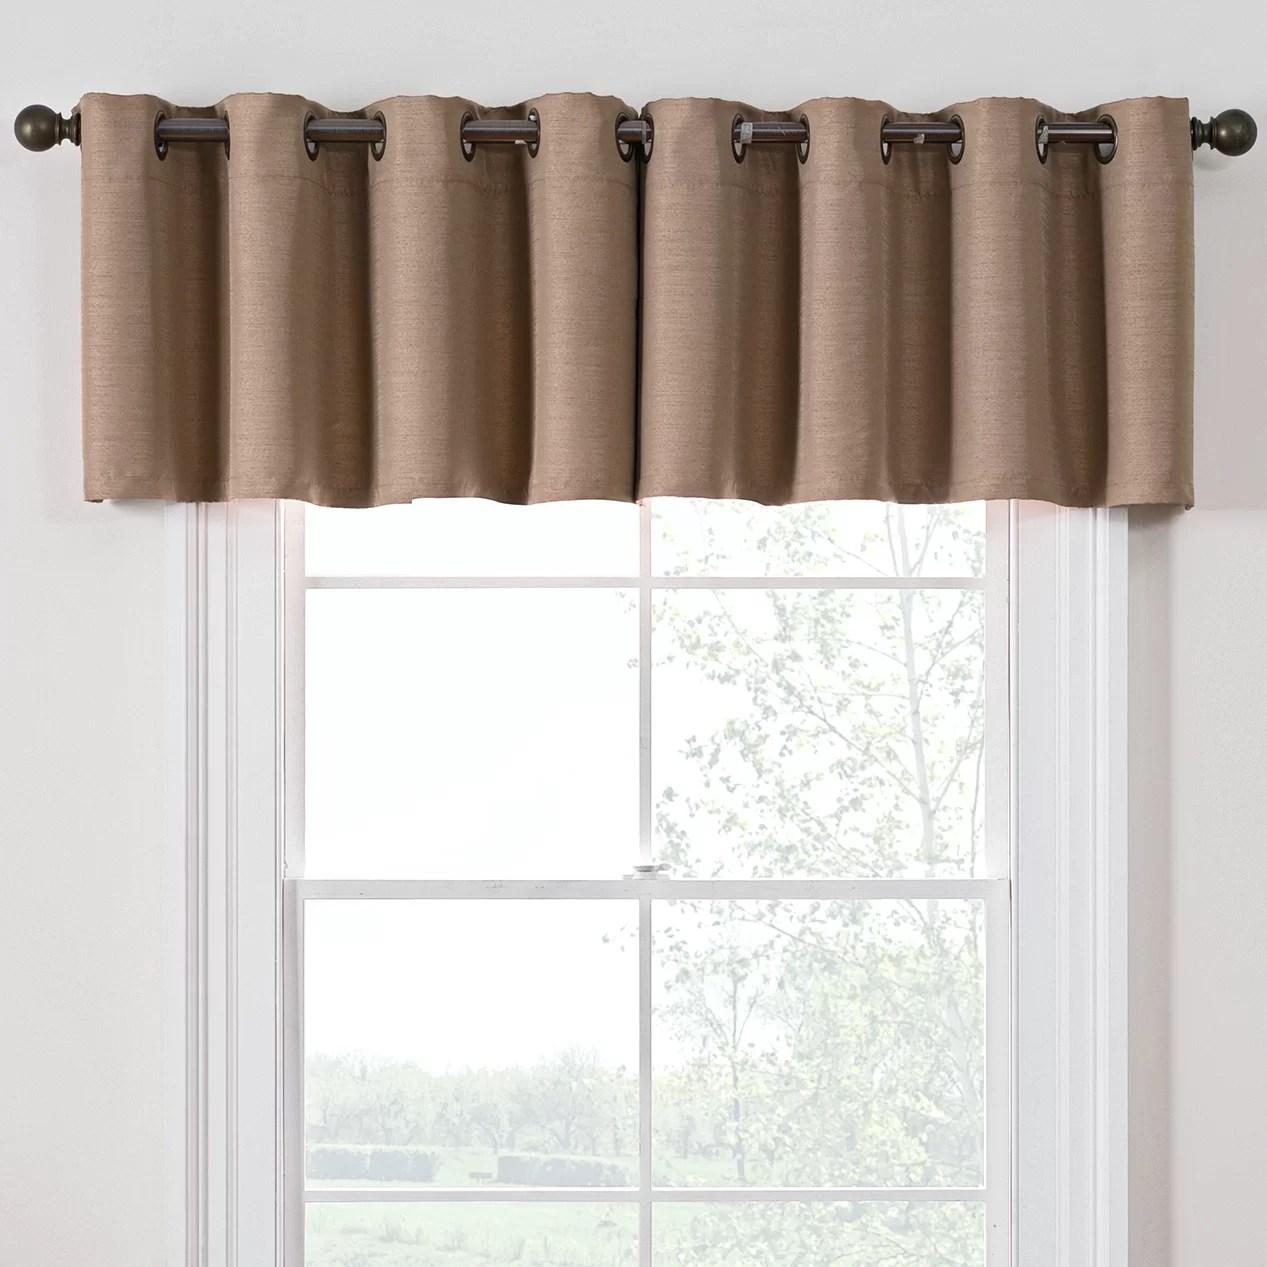 Style Domain Antique Satin 52 Curtain Valance